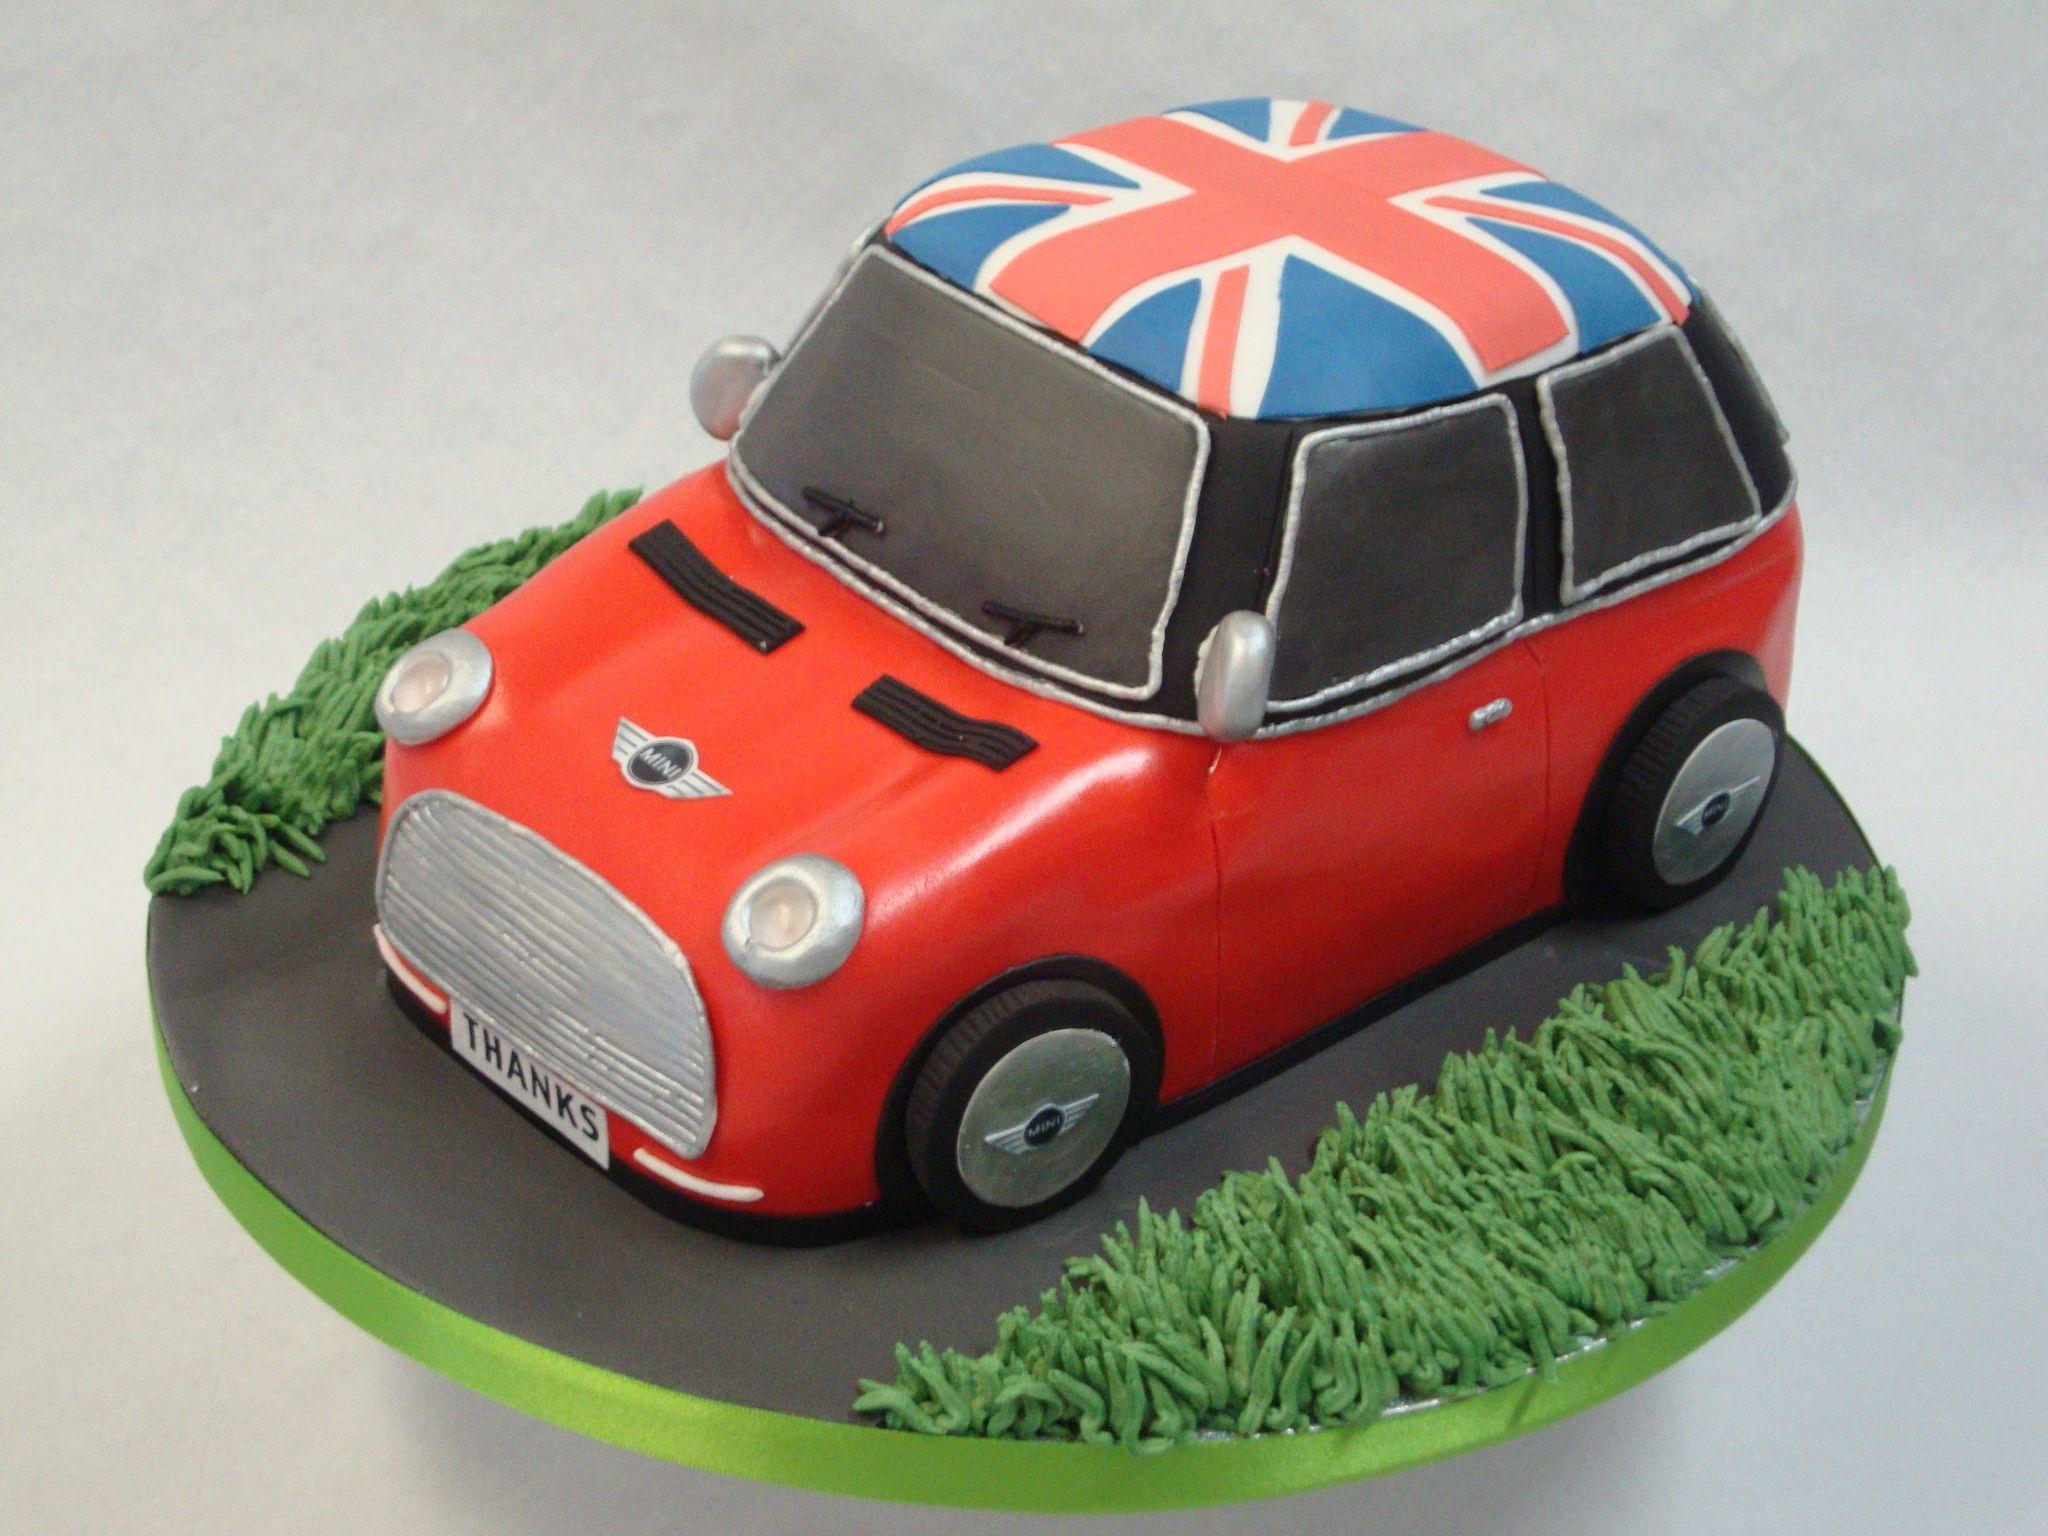 Birthday Cake For Car ~ Car cake google search birthday ideas pinterest cakes mini and